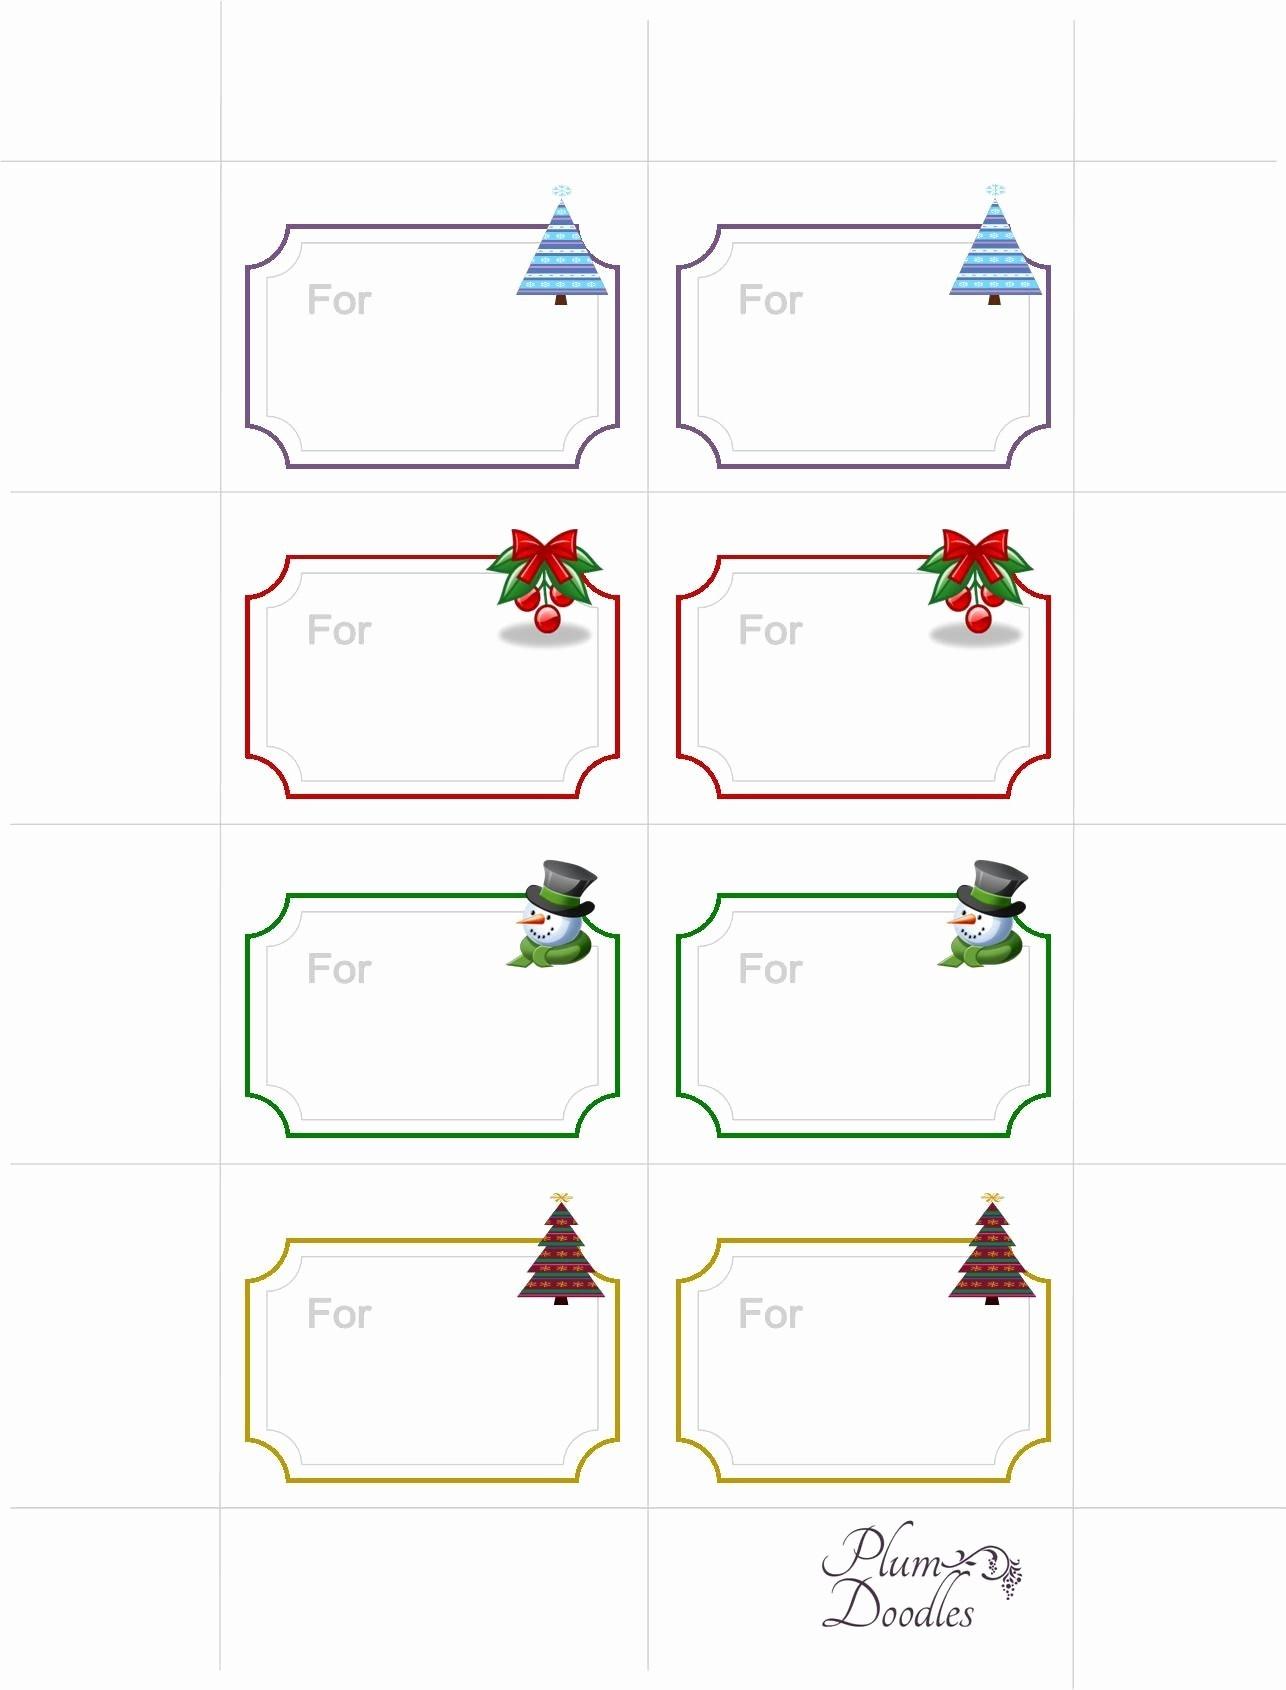 Free Printable Gift Tags Template | Pictimilitude - Free Printable Blank Gift Tags